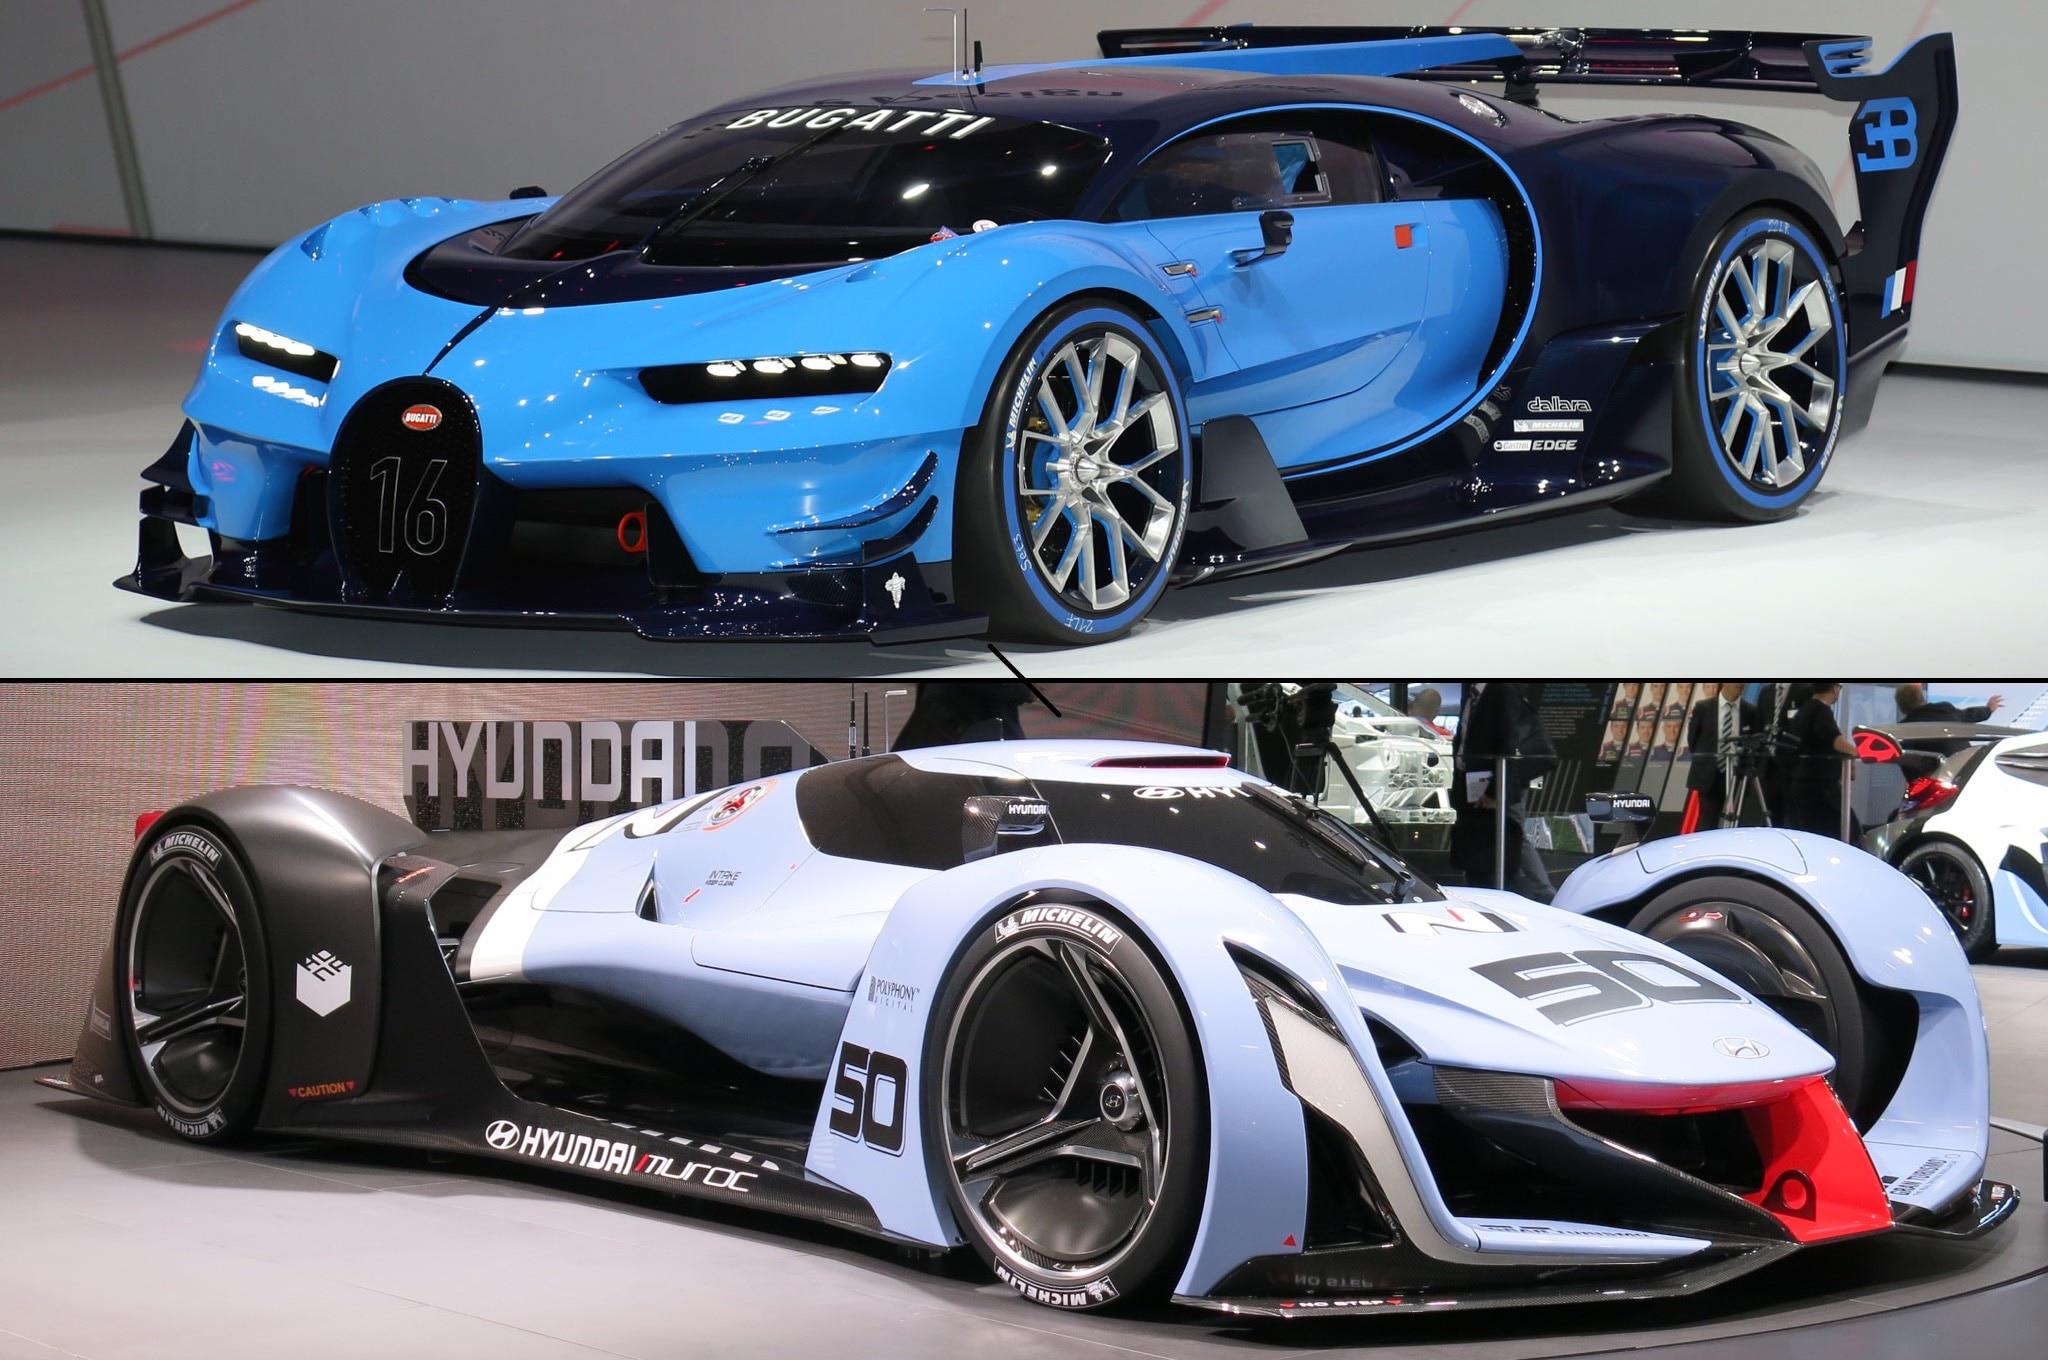 Bugatti Hyundai Vision Gran Turismo Front Pair